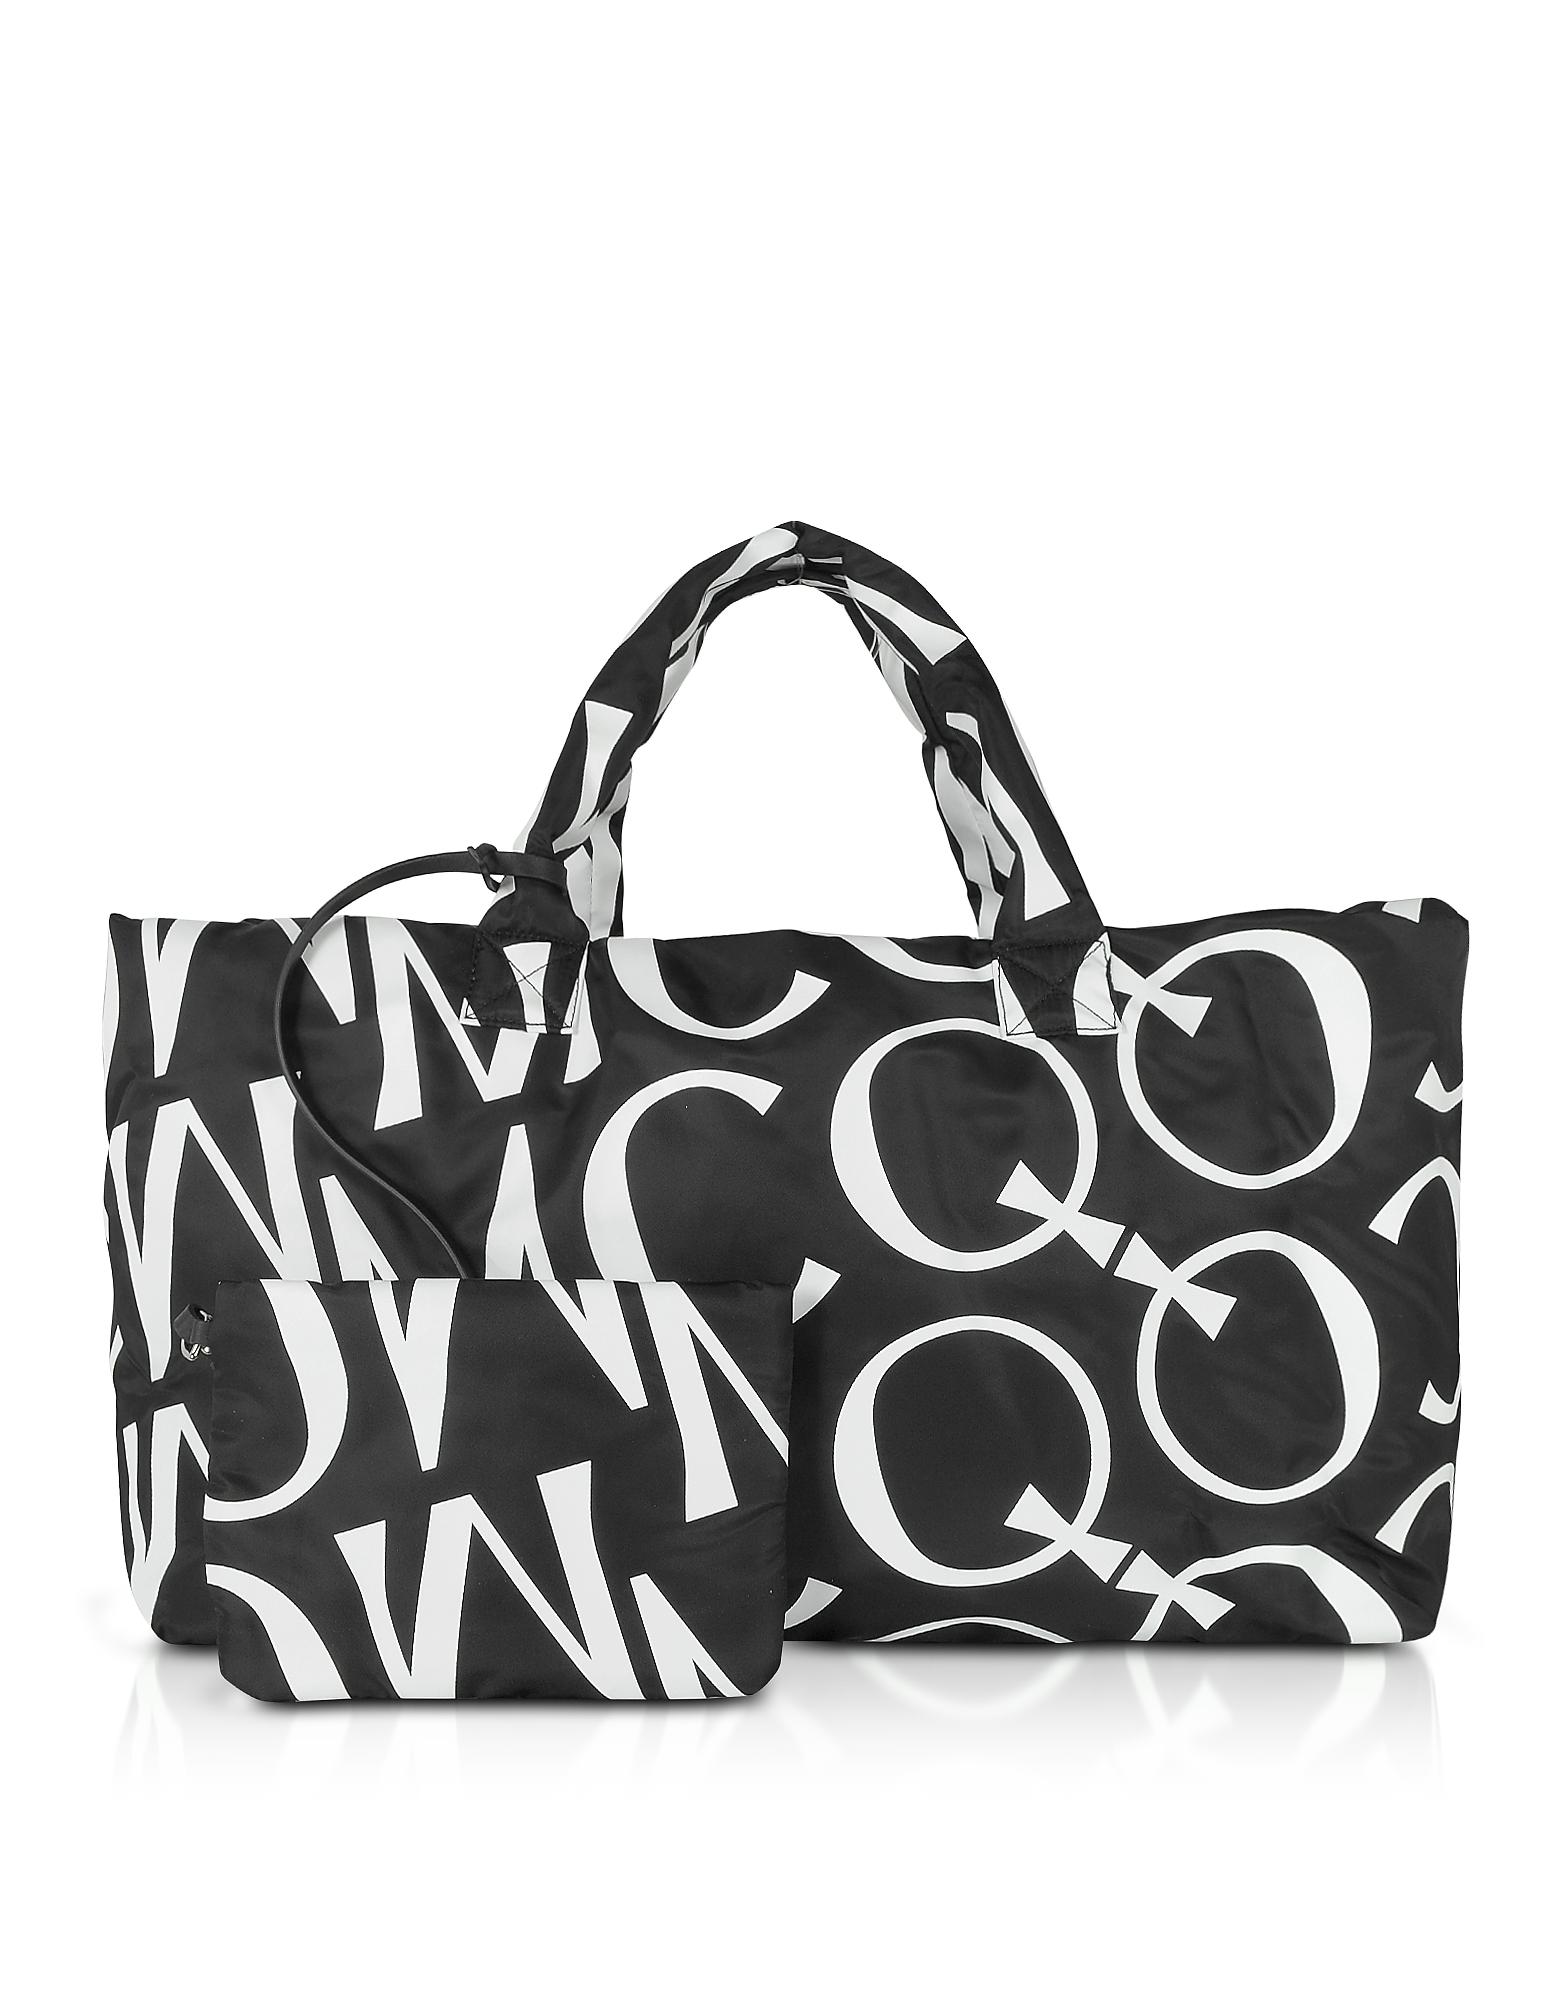 McQ Alexander McQueen Designer Handbags, Inside Out Black & White Signature Tote Bag